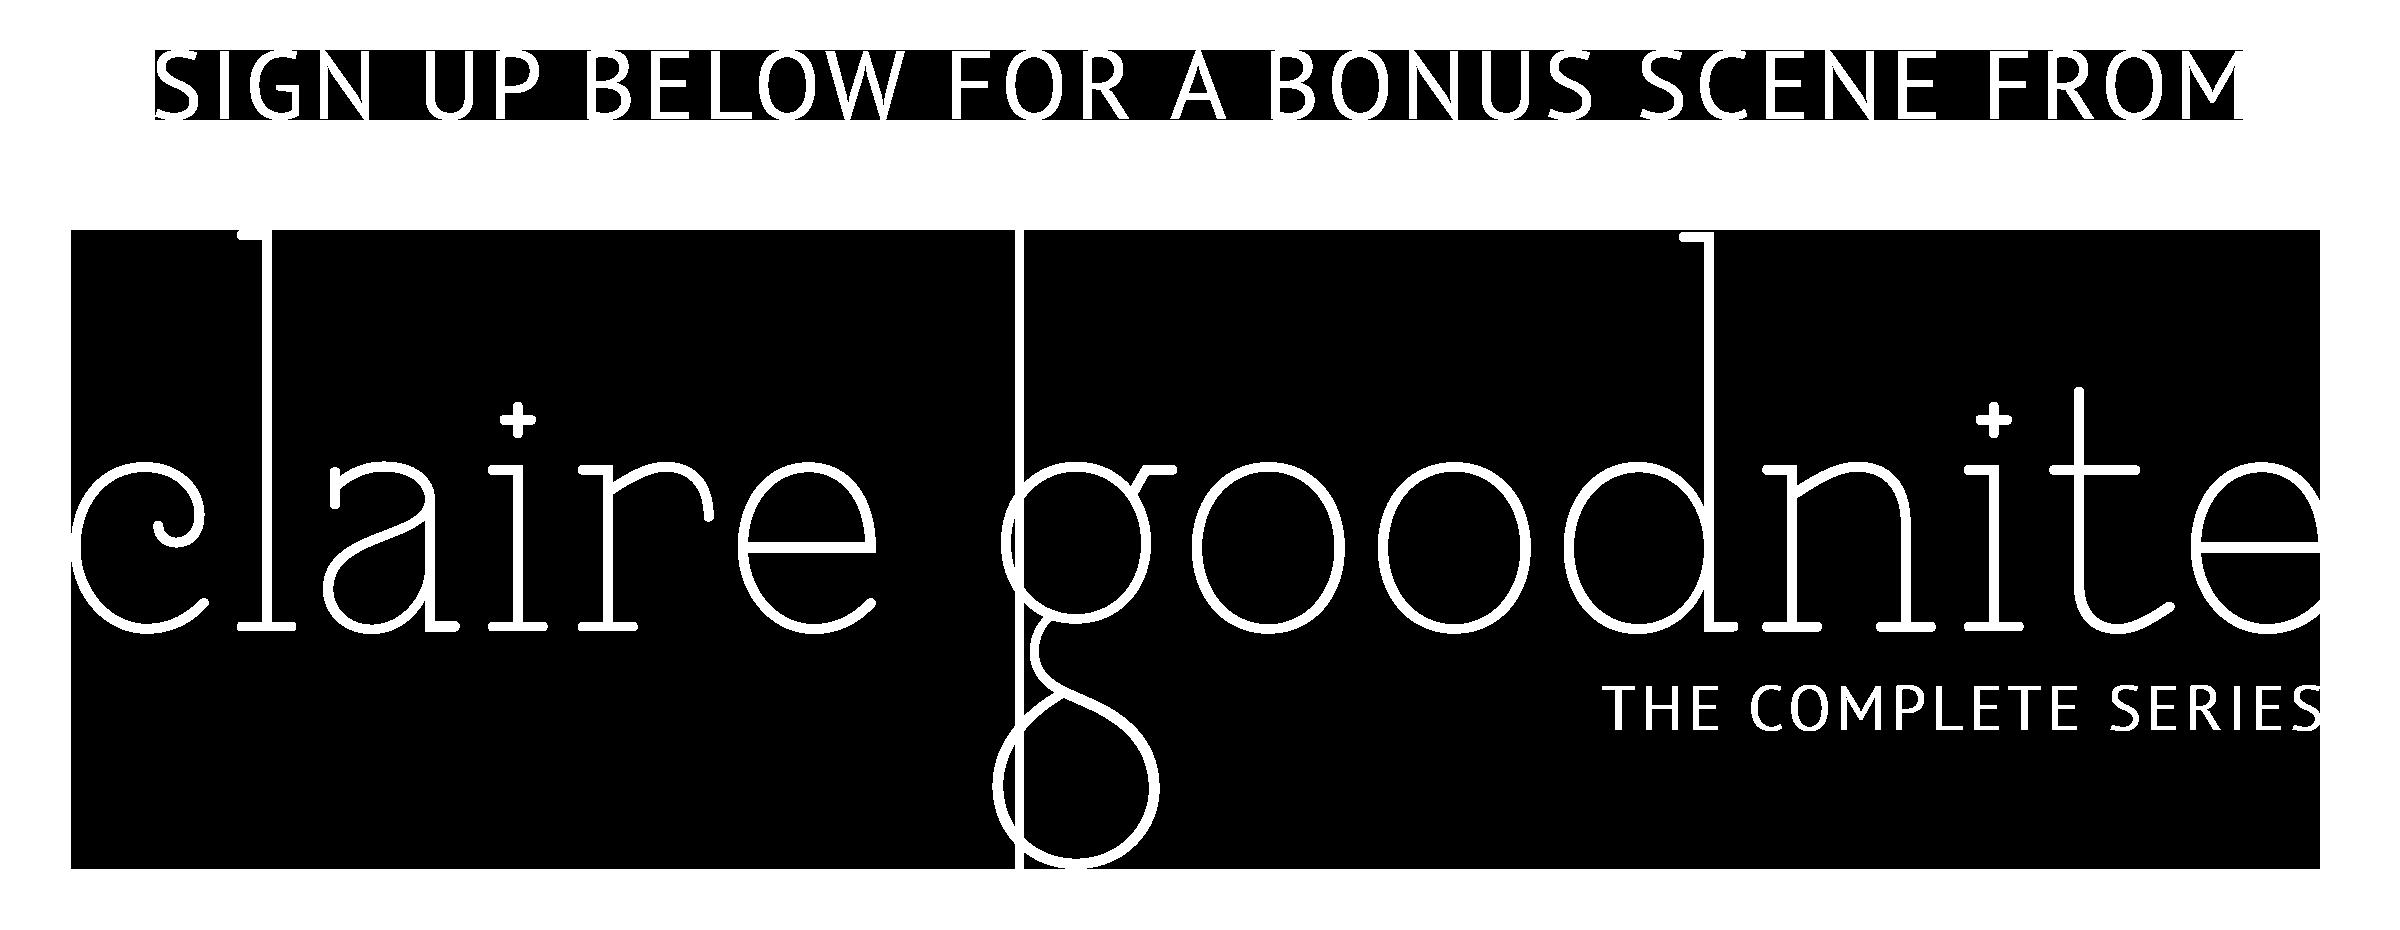 SignupClaireGoodnite